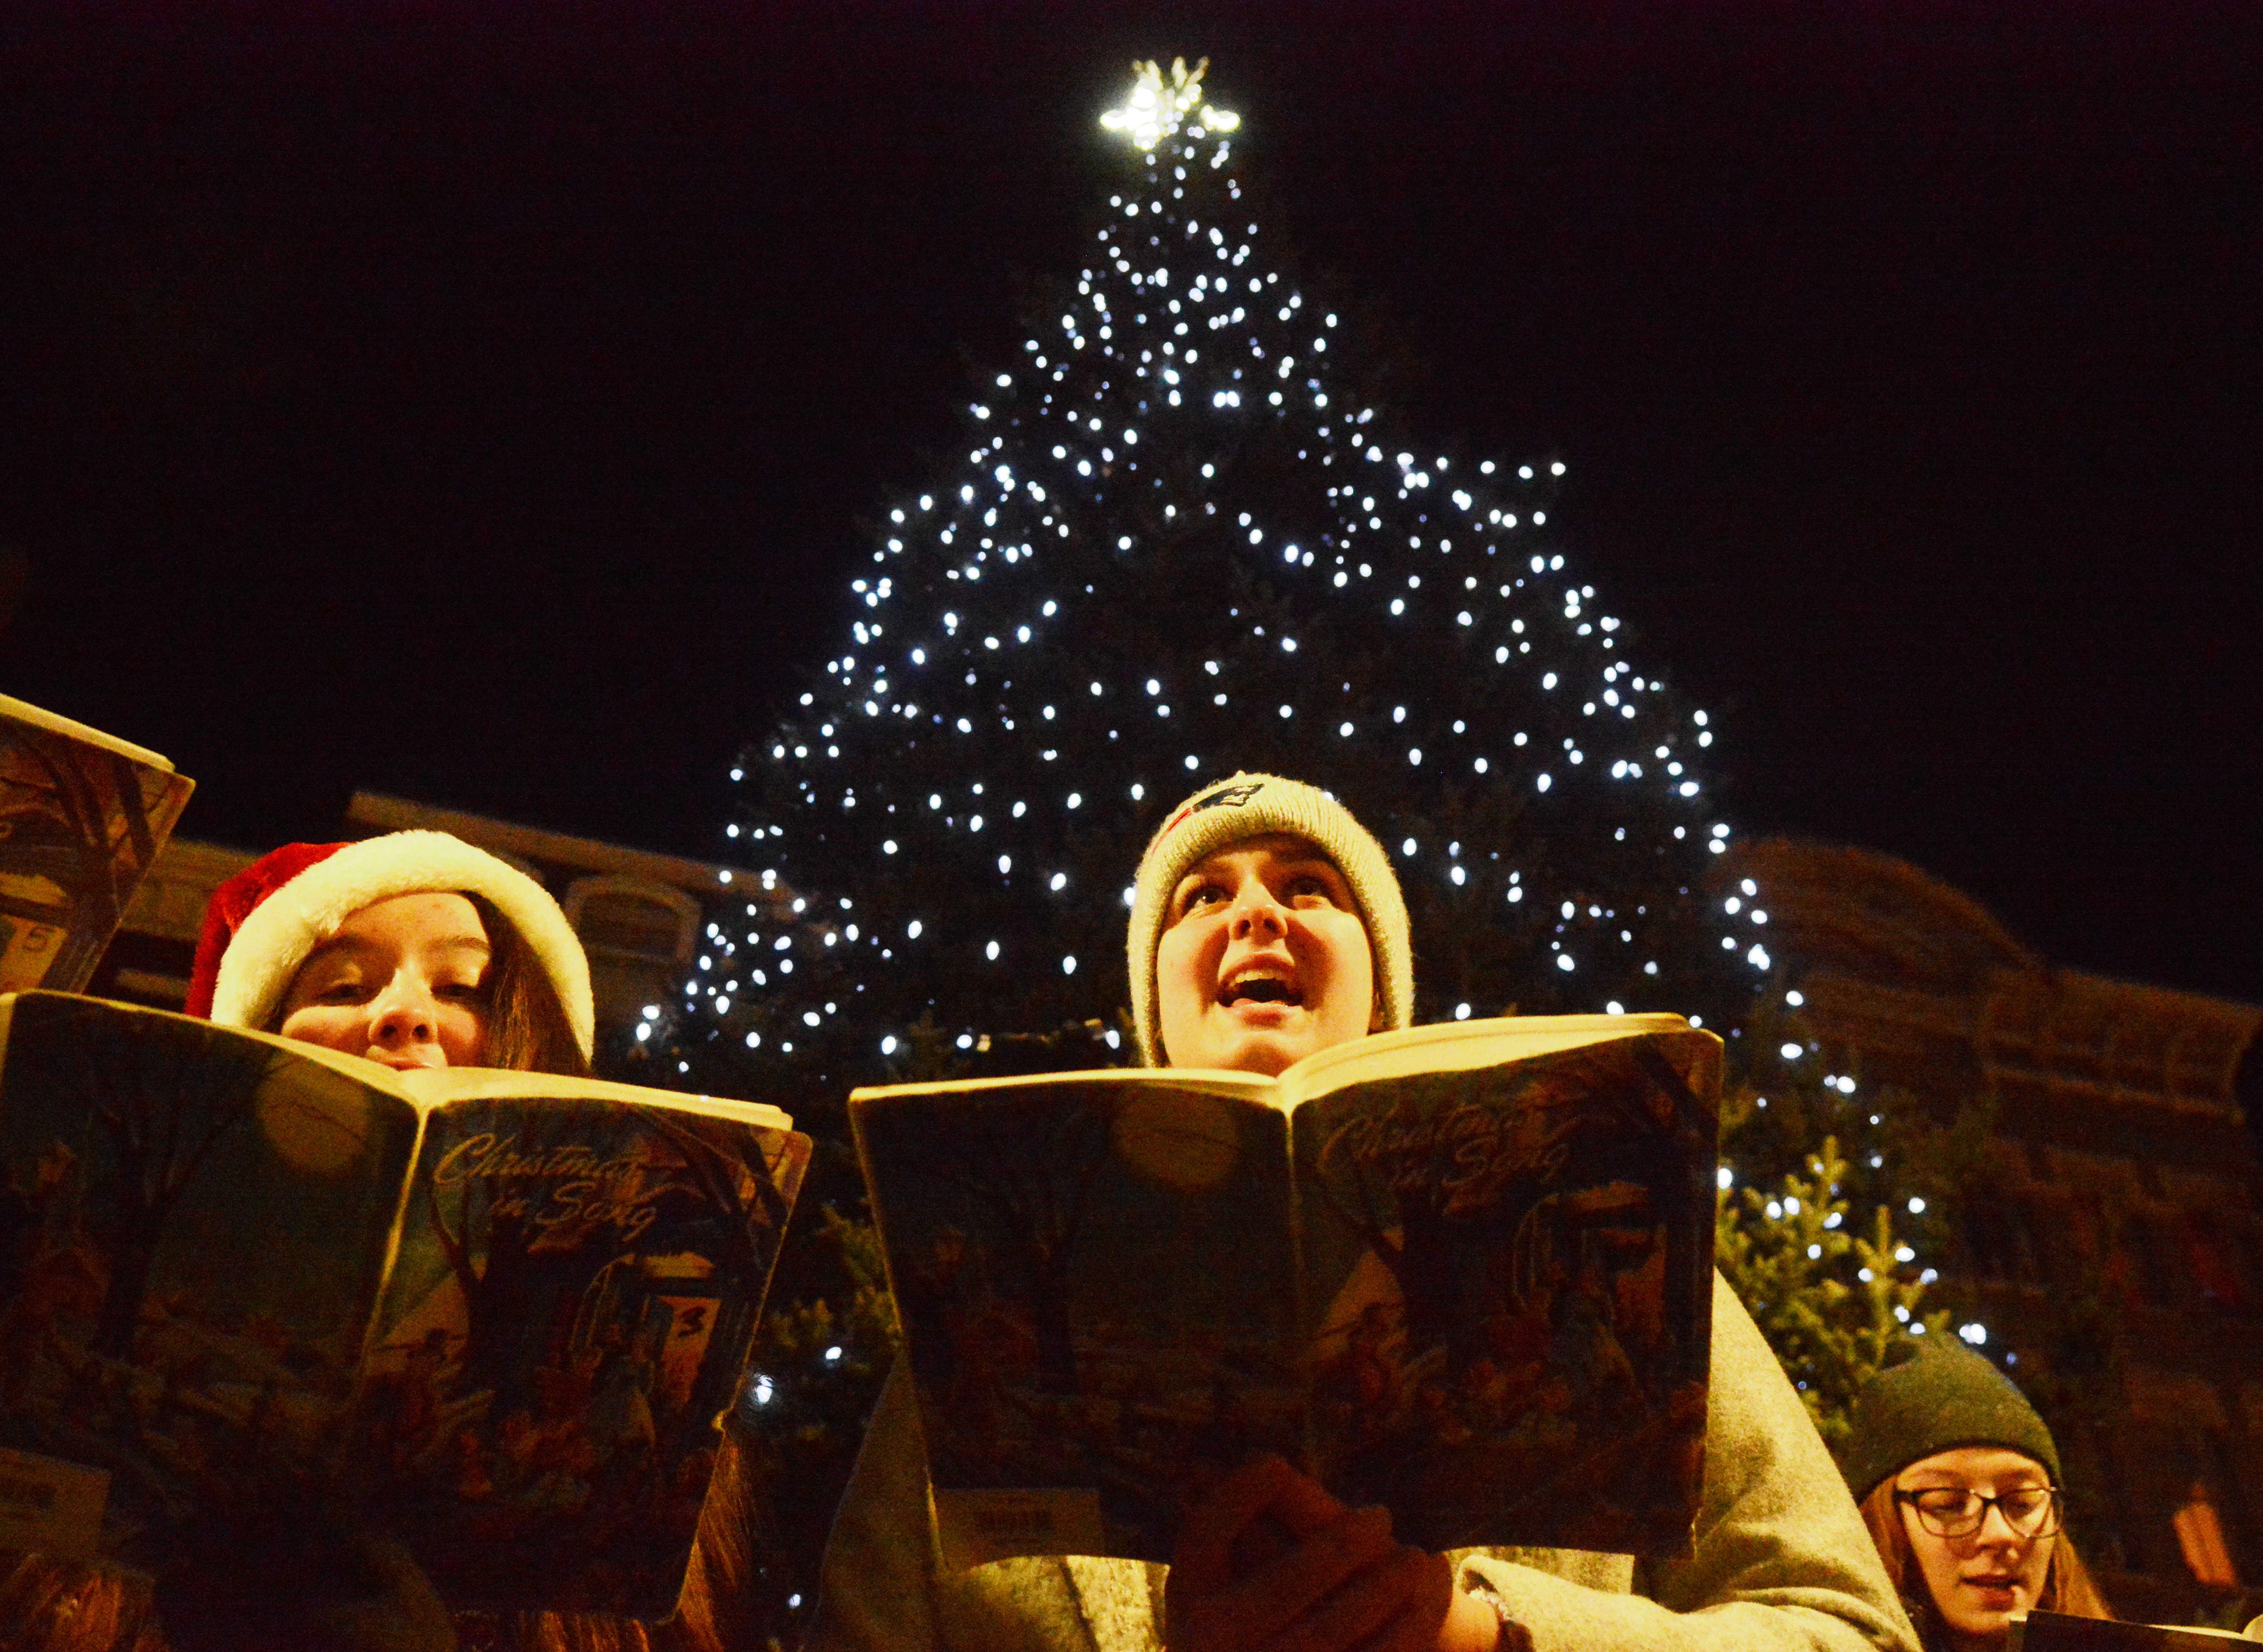 Christmas Parad Bangor 2020 Festival of Lights parade kicks off holiday season in Bangor